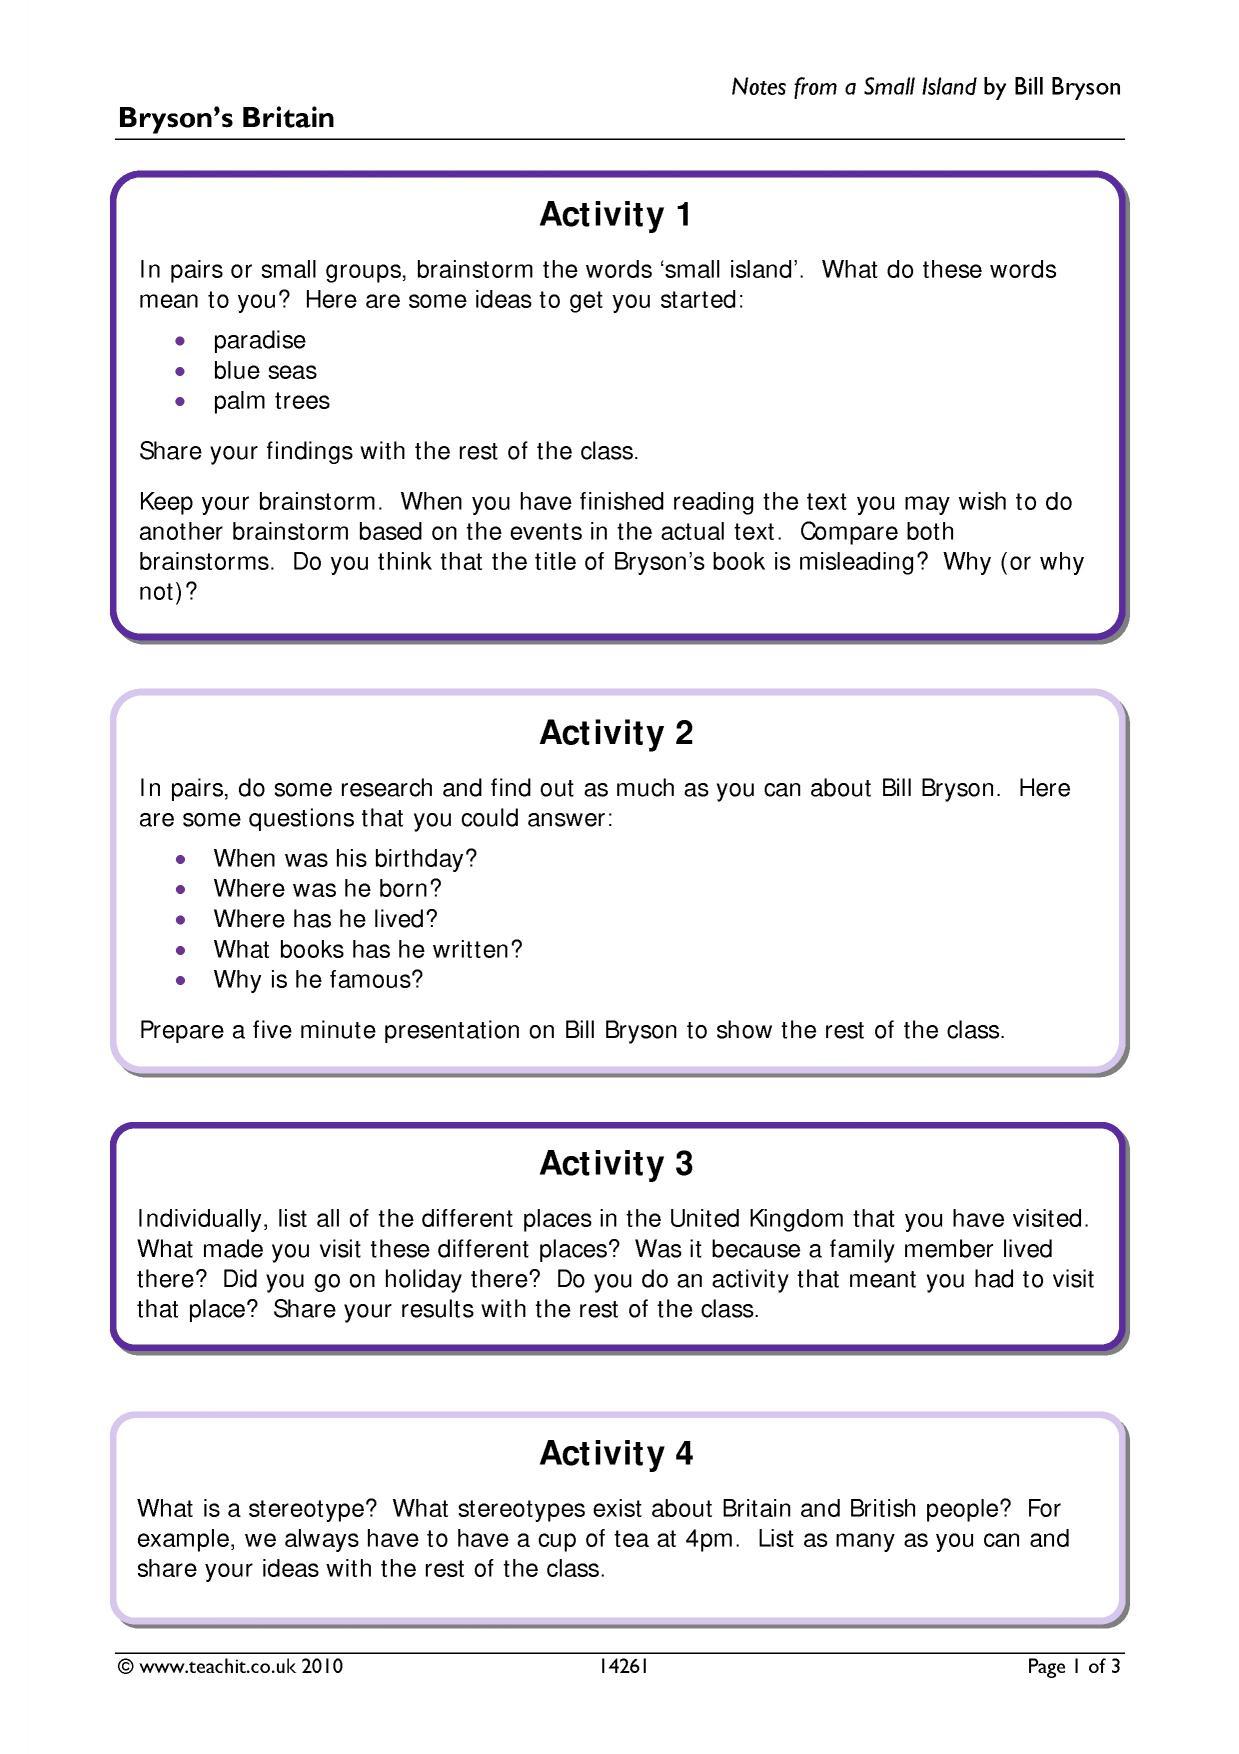 bbc bitesize macbeth essay Free teaching resources for ks3 english and drama teachers based on shakespeare's classic play, 'macbeth' essay sheet - how macbeth changes.